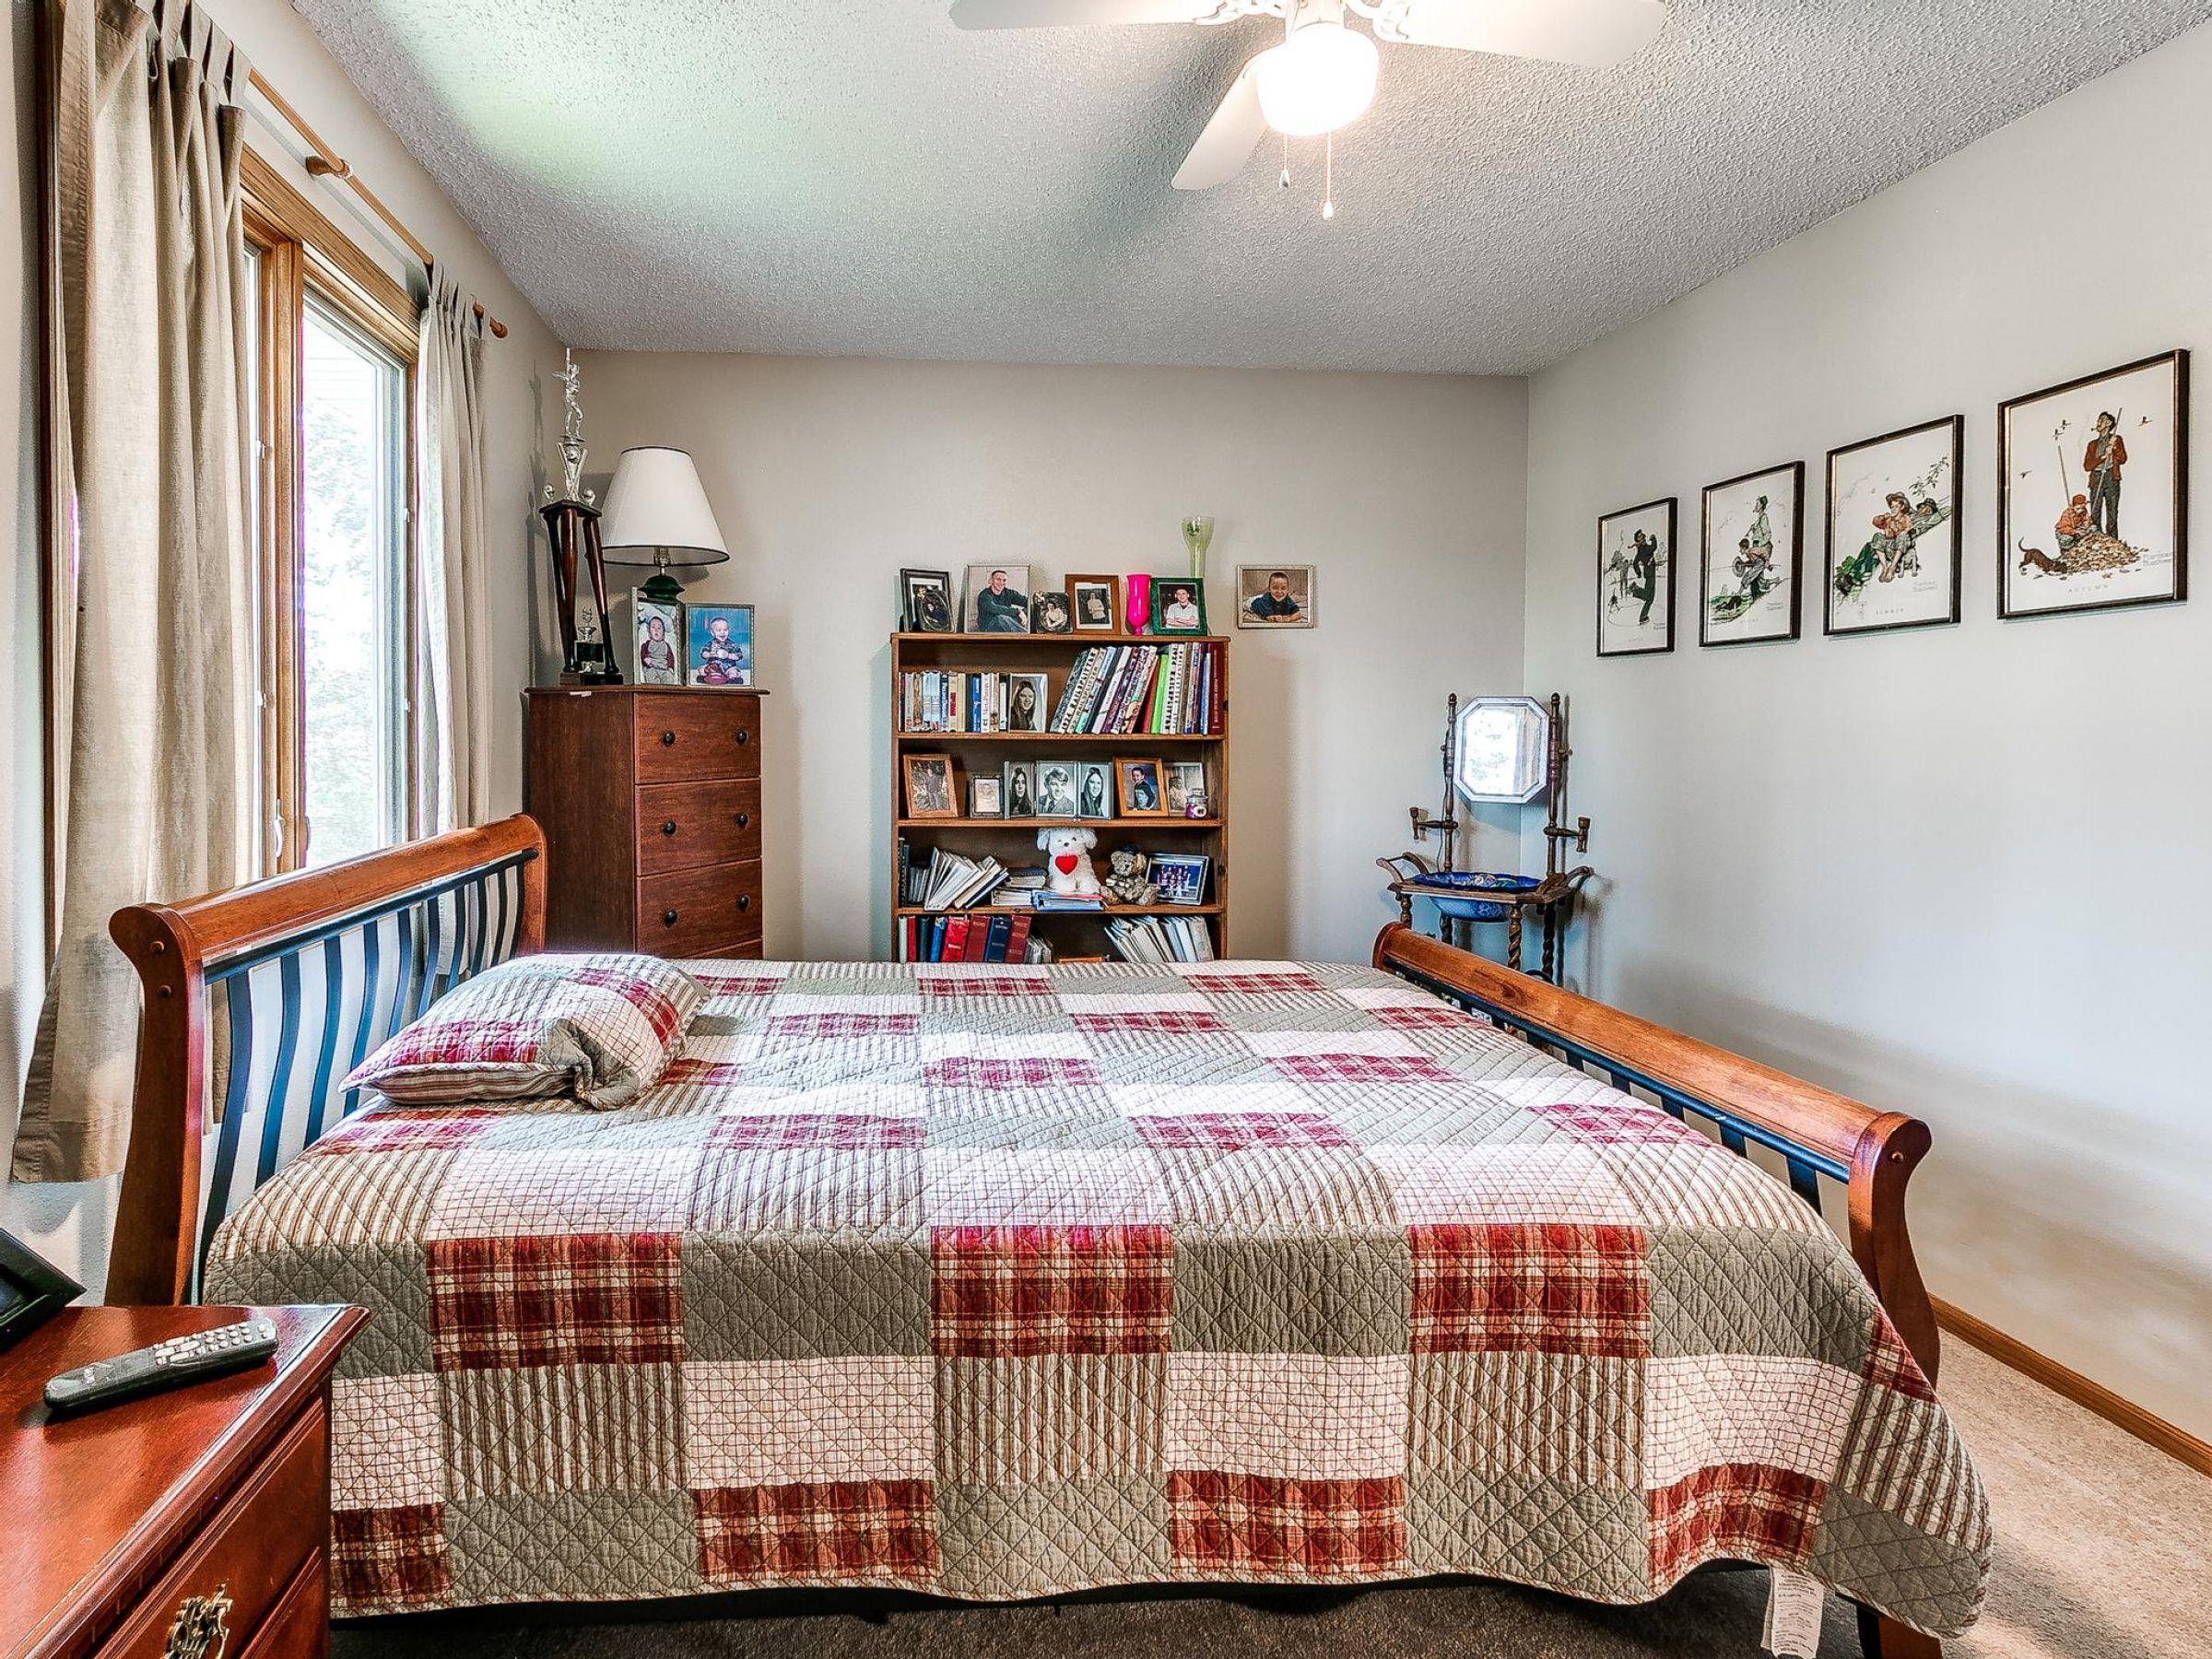 residential-warren-county-iowa-3-acres-listing-number-15593-4-2021-06-18-155758.jpg